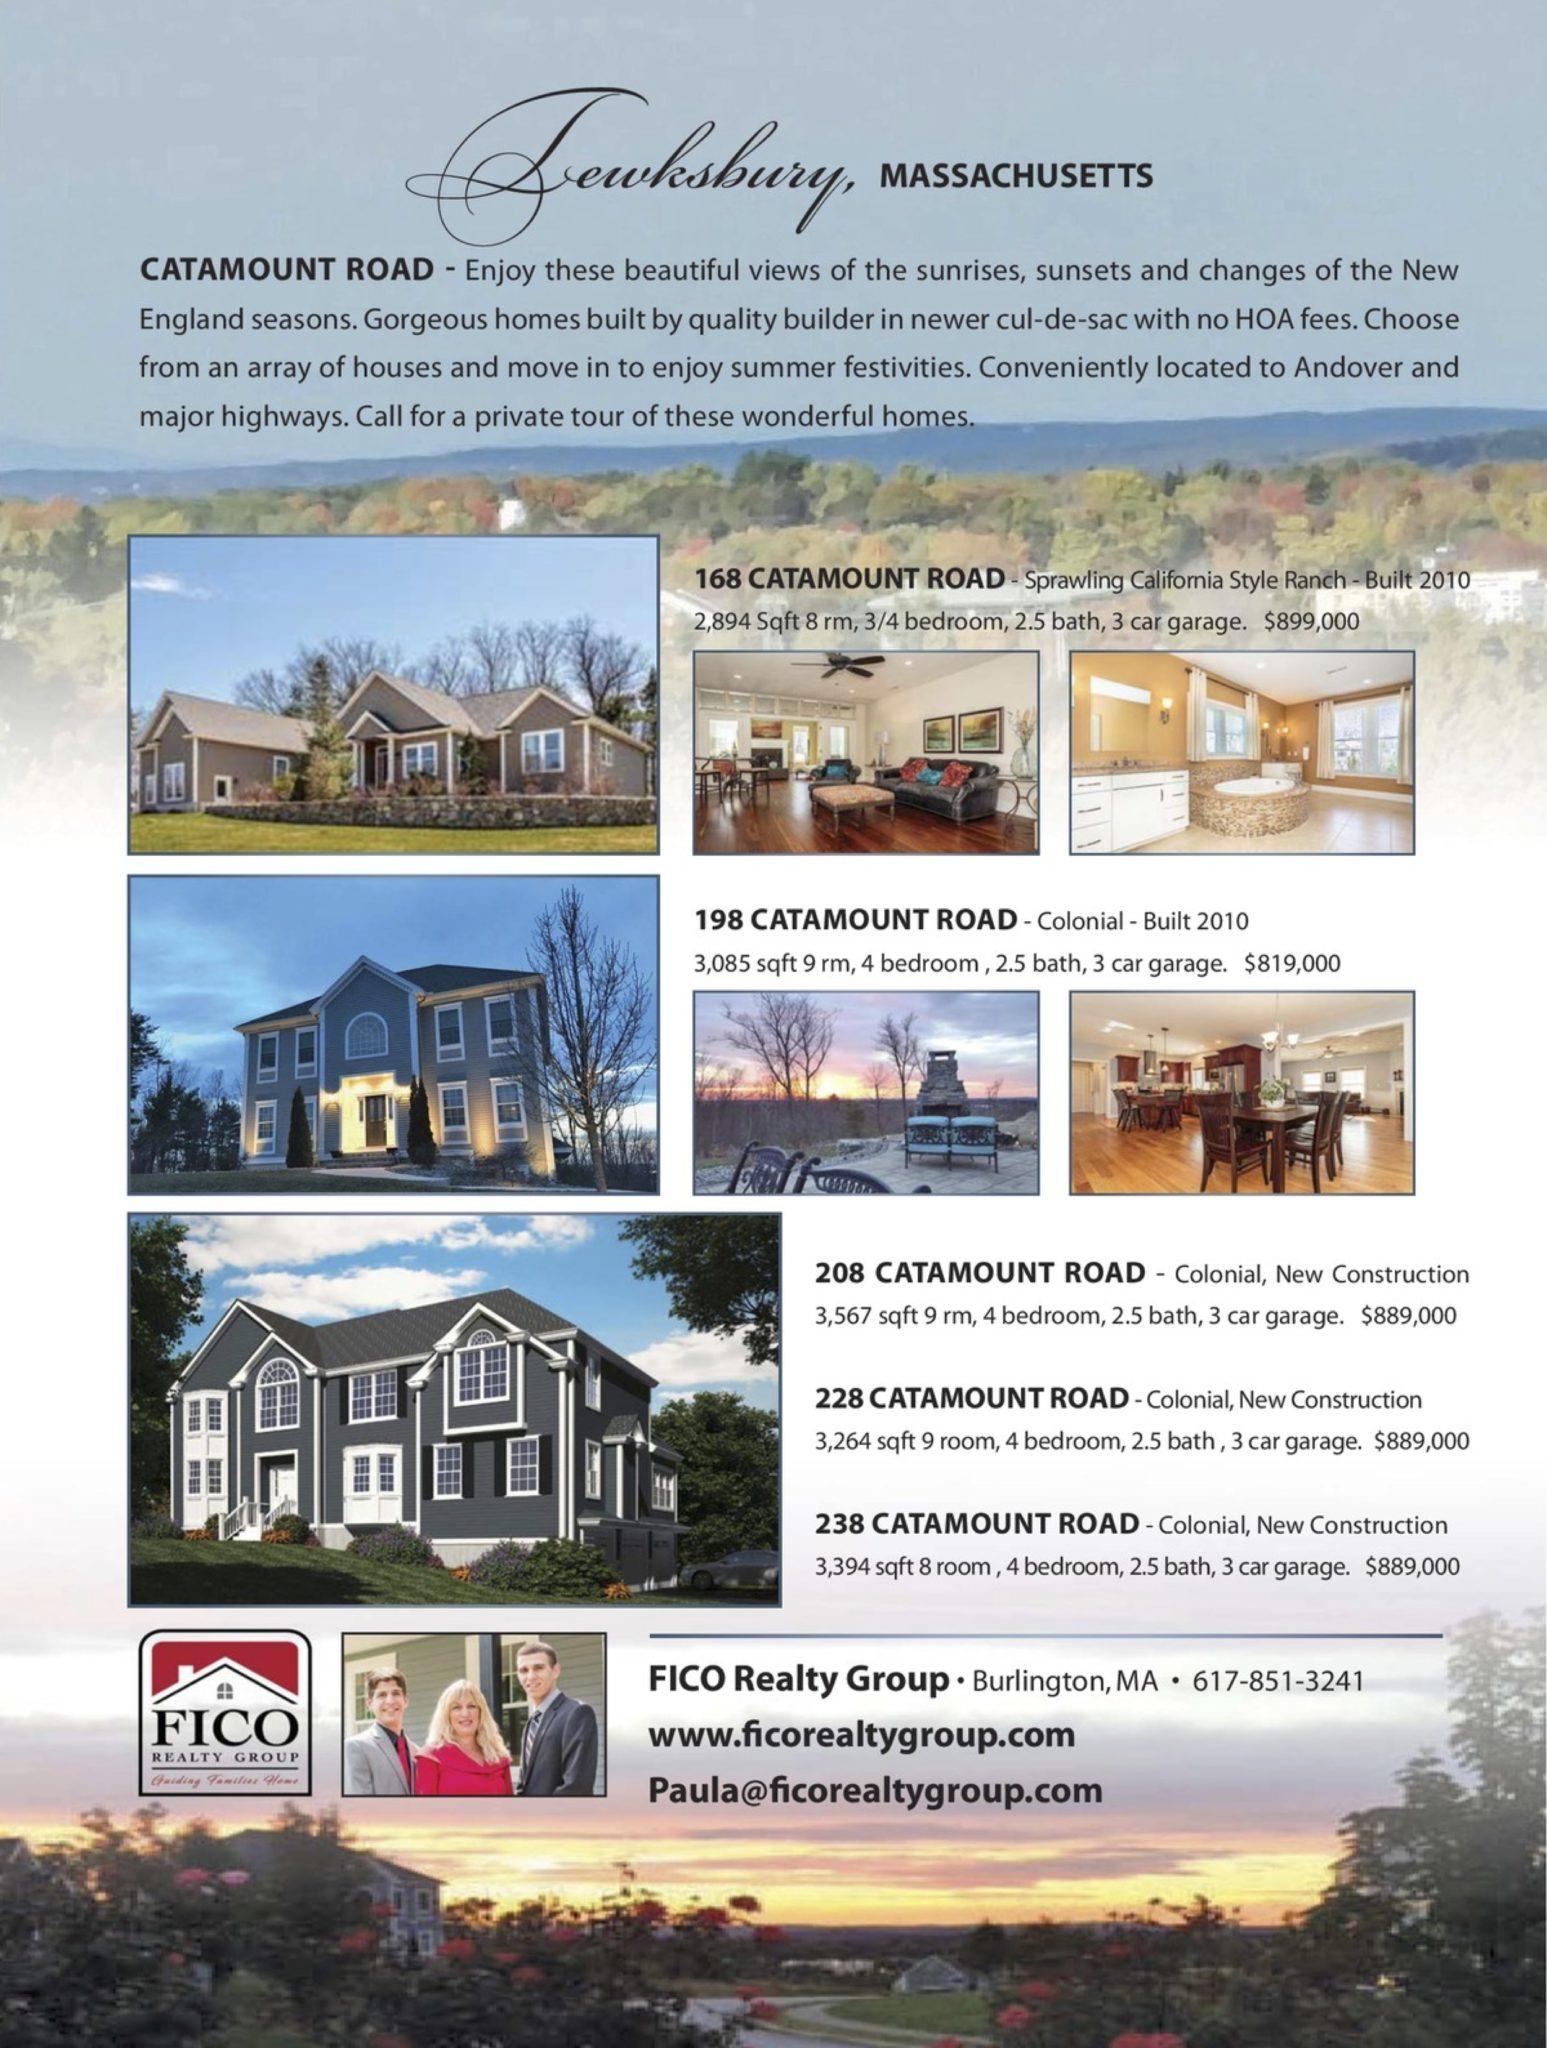 distinctive home magazine featuring catamount road